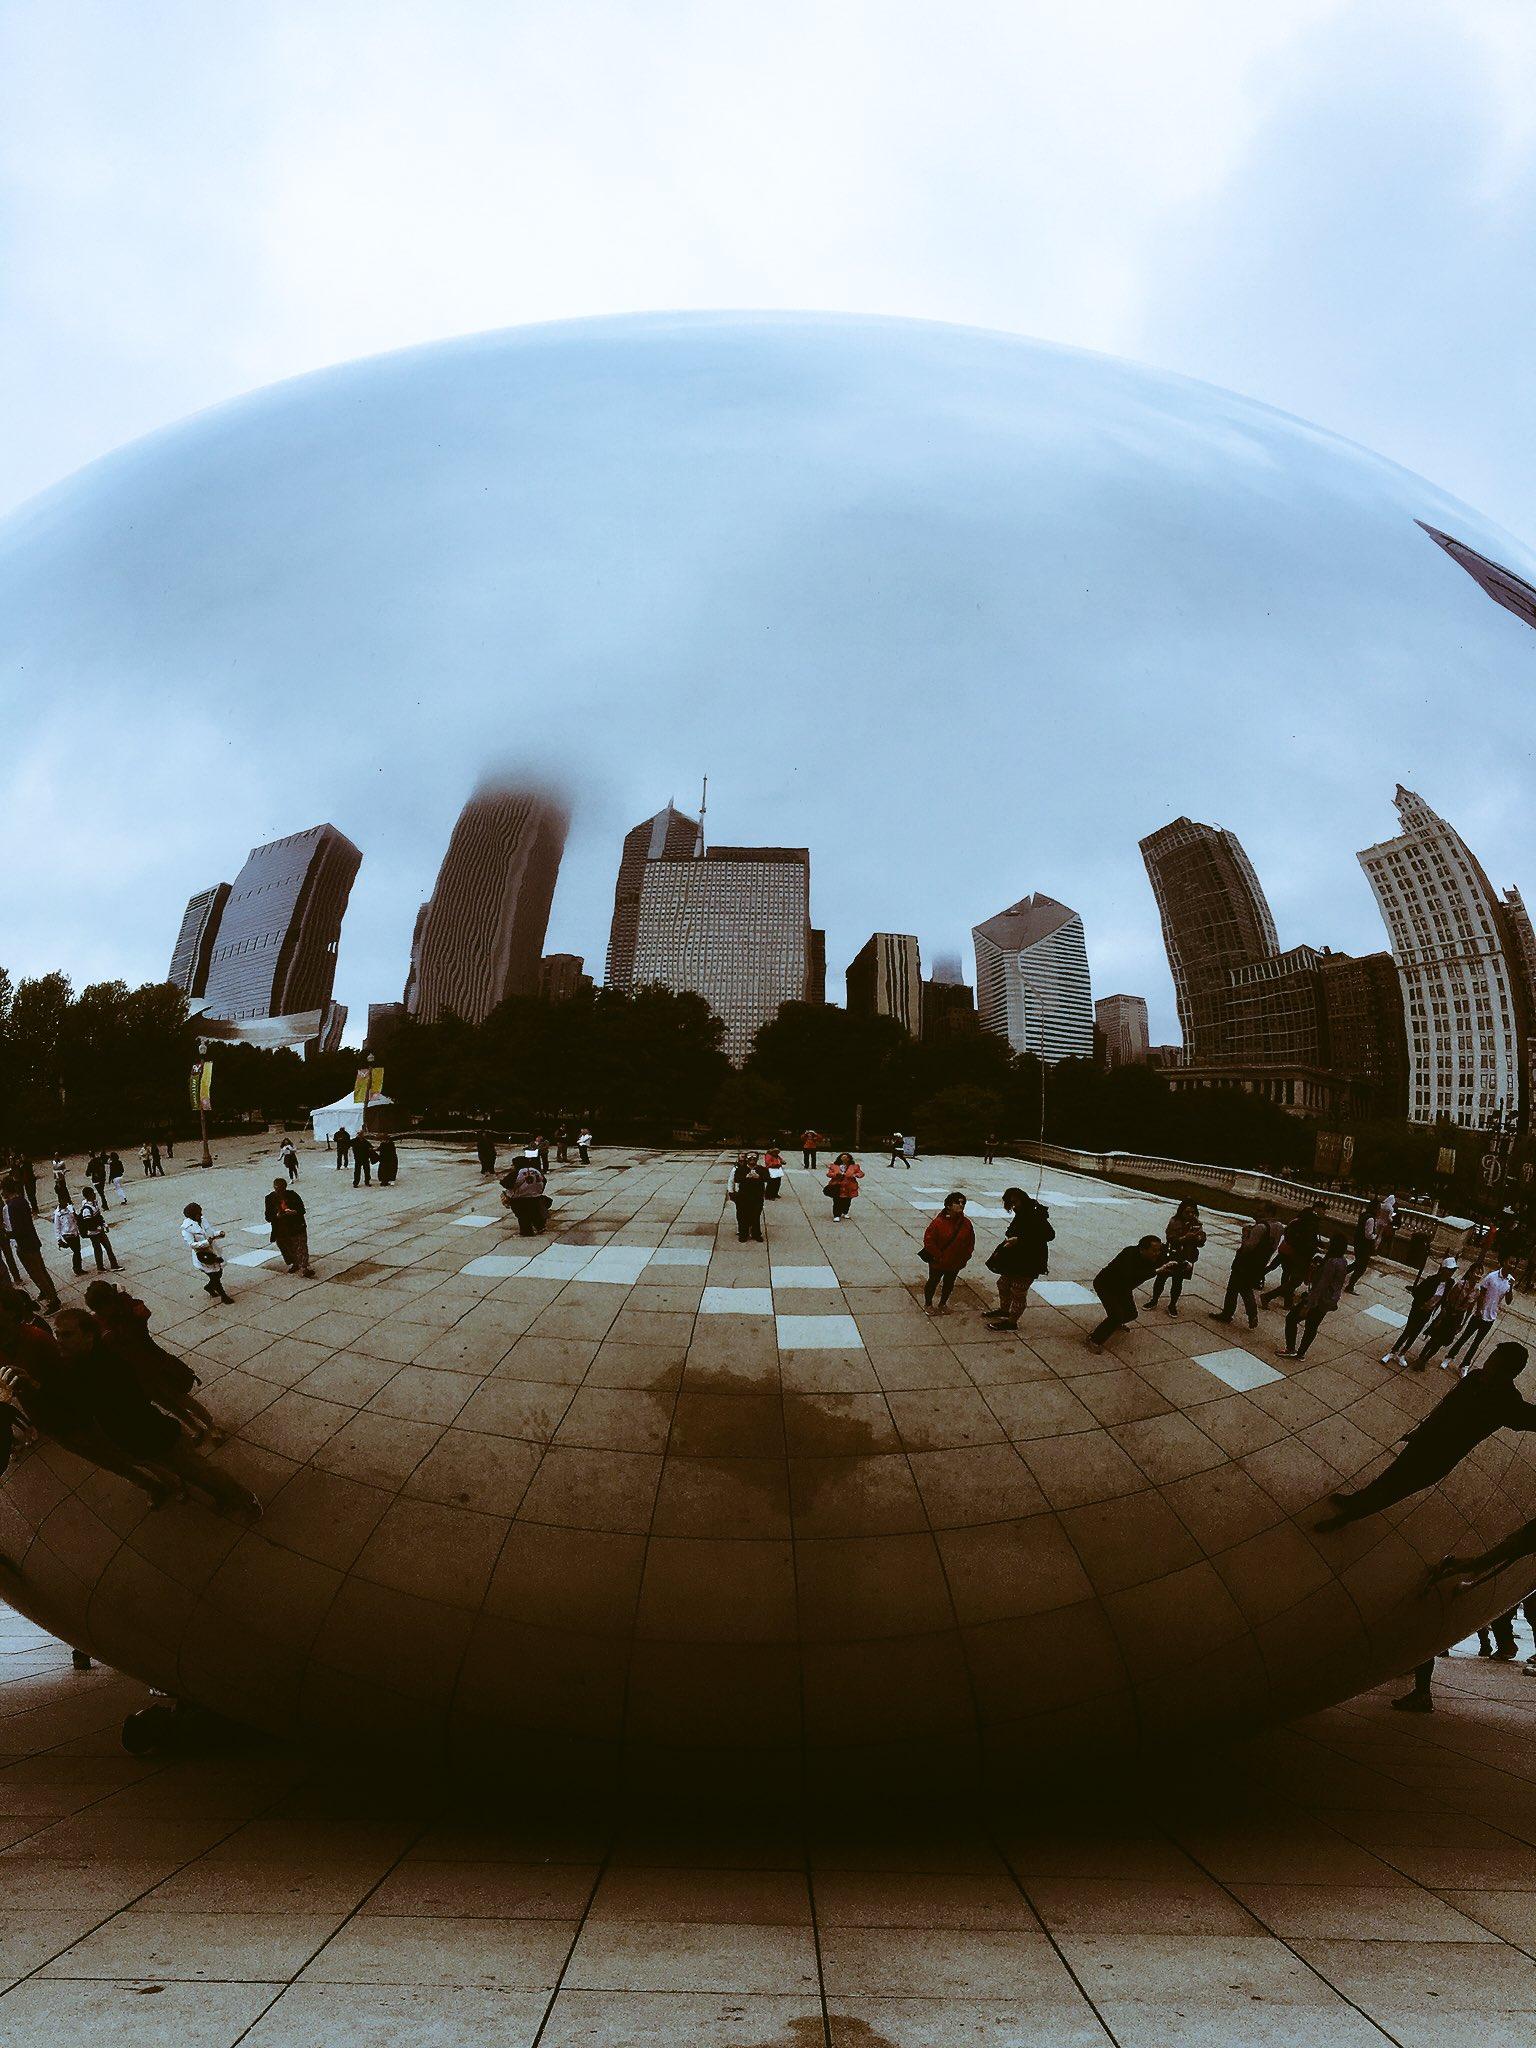 I'm here, Chicago! https://t.co/tSZuLM5PMG